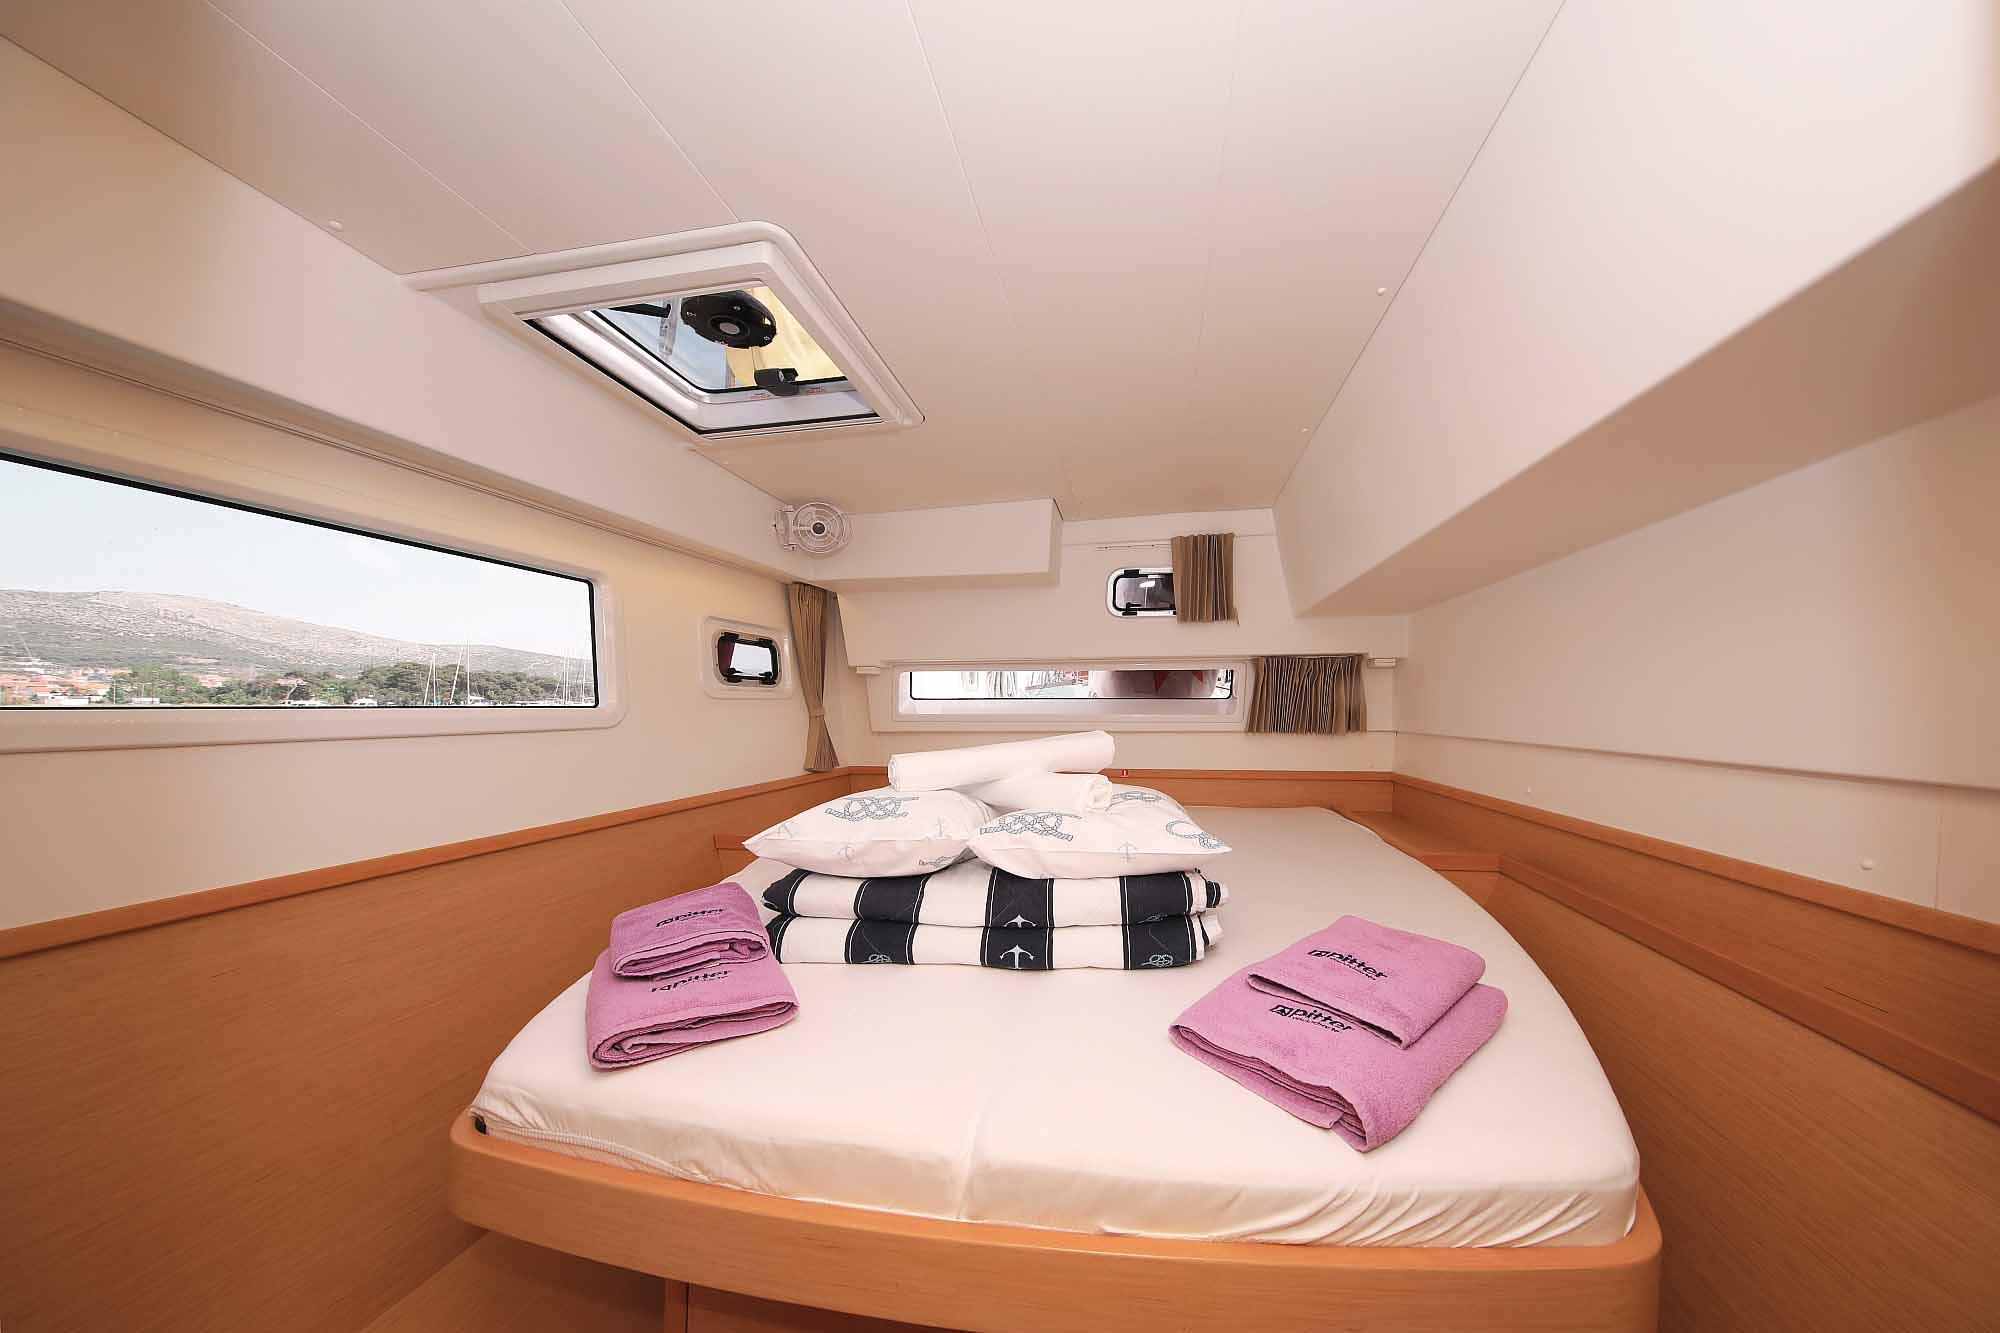 Kingsize Betten in alle Kabinen: Bereit für Charter Kanaren und Charter Kroatien